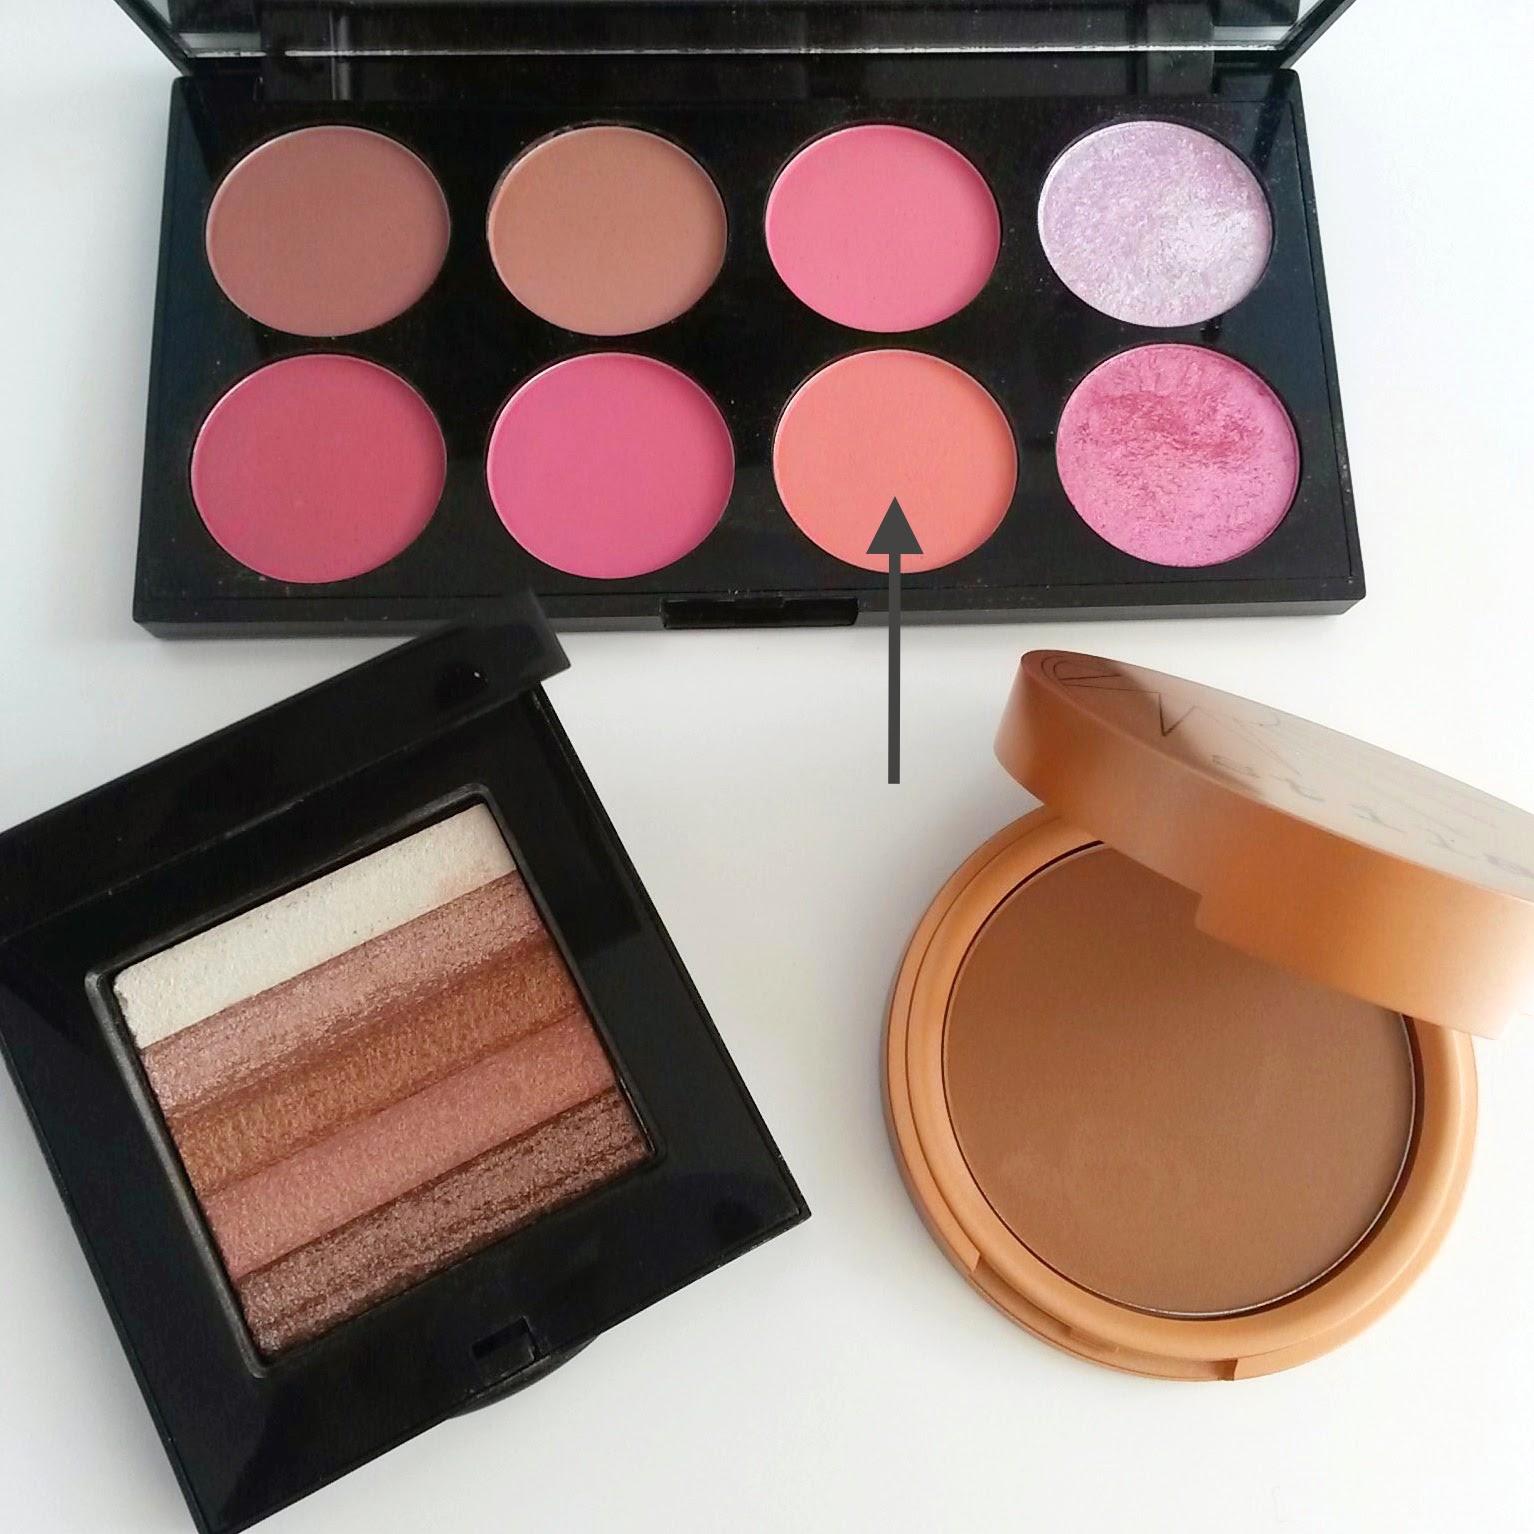 Glowing Bronzed Skin Makeup